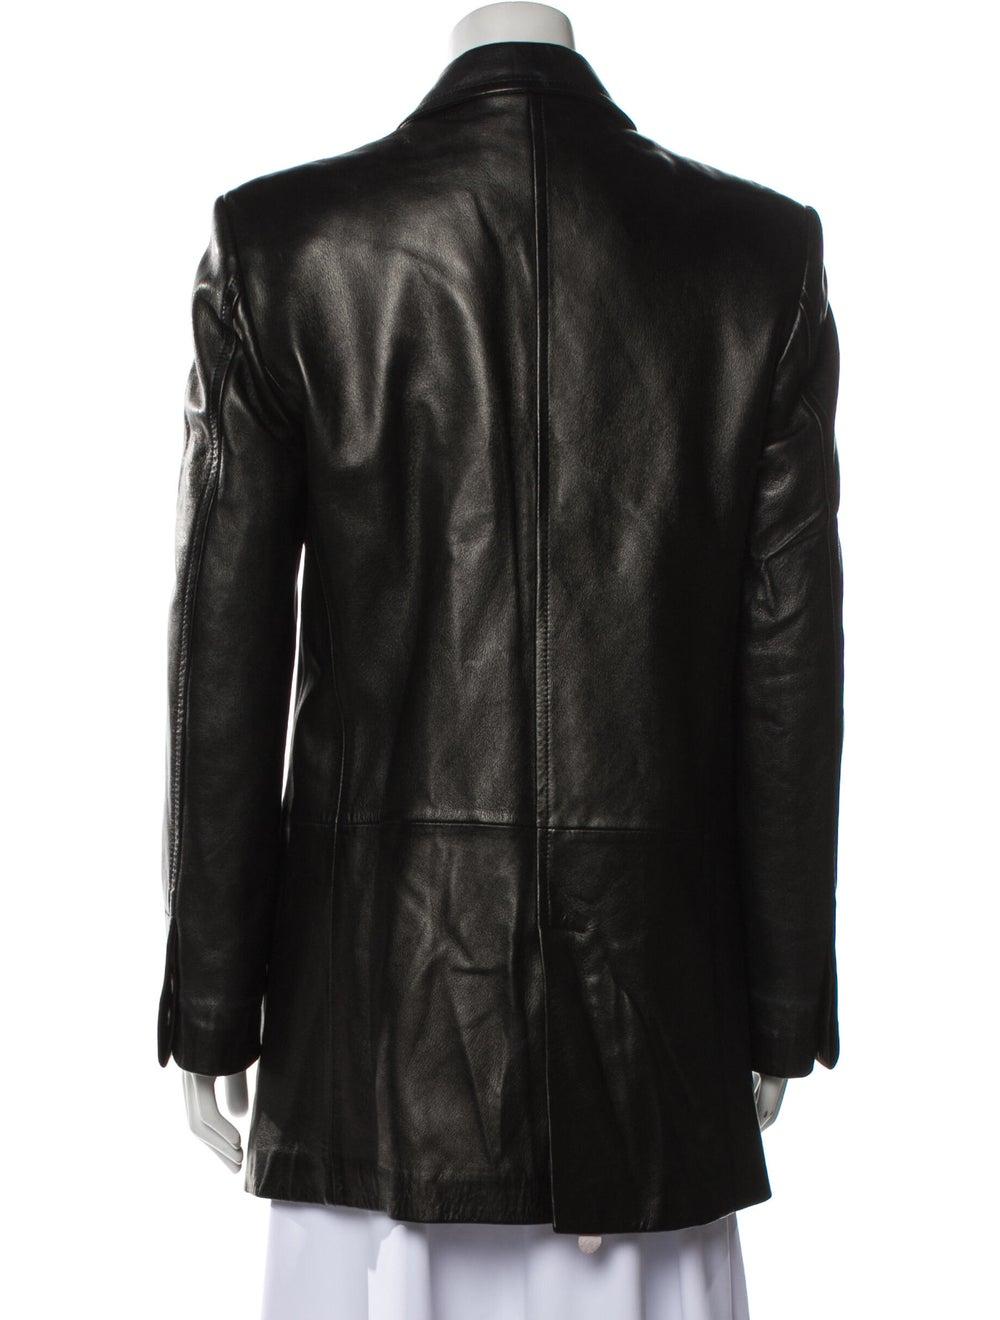 Gucci Vintage 1990's Trench Coat Black - image 3